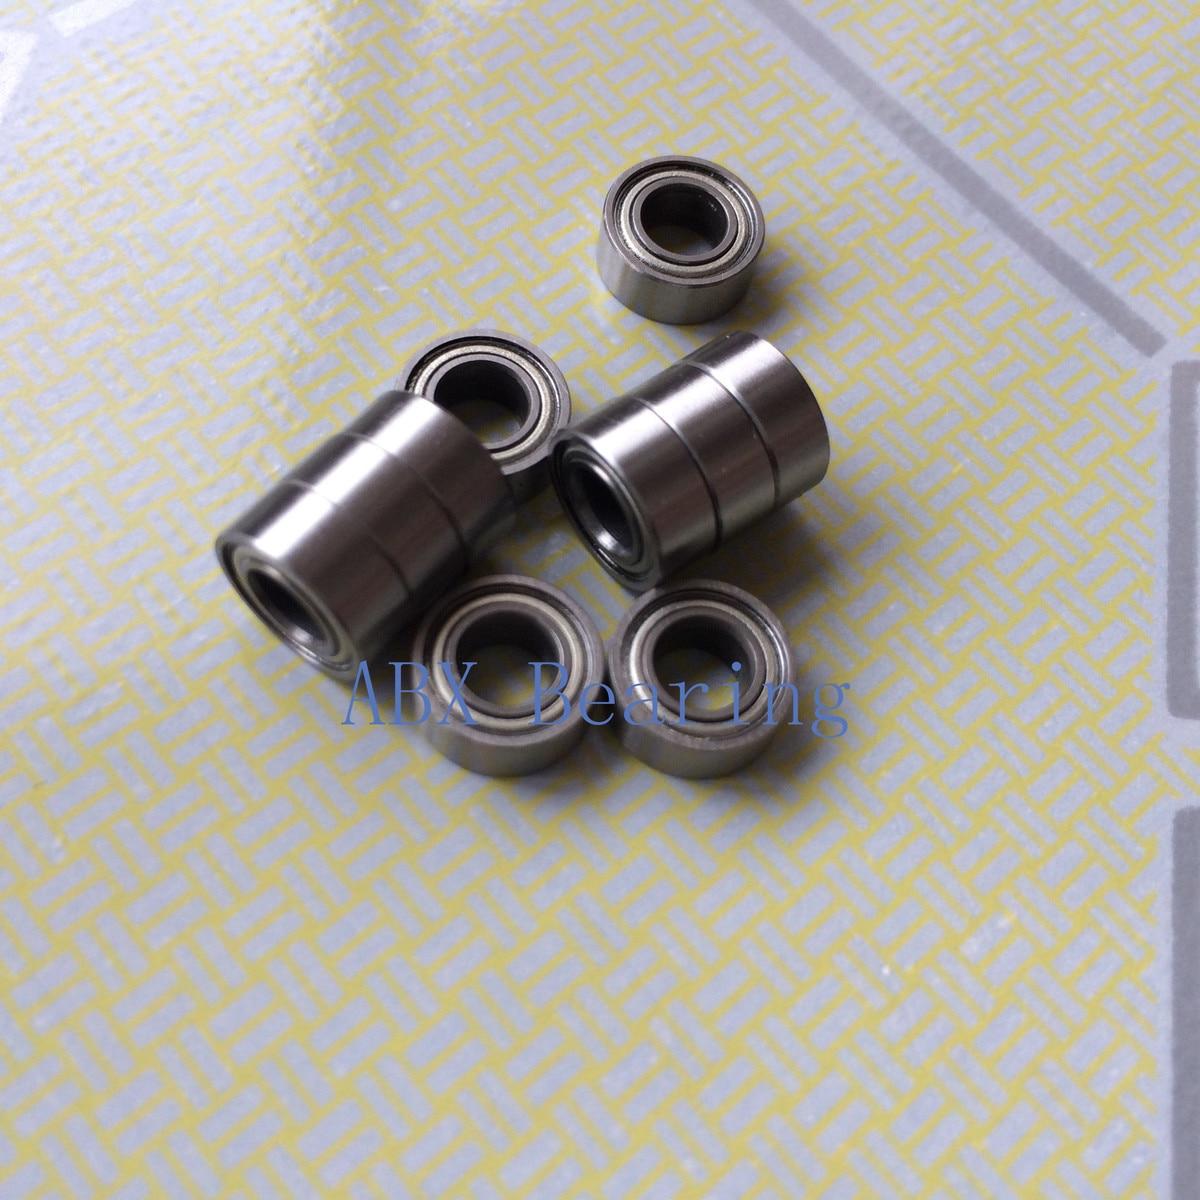 Free shipping 10pcs MR62ZZ R-620ZZ MR62Z MR62 ball bearing 2x6x2.5 mm miniature bearing 2*6*2.5 mm mini bearing free shipping 10pcs mr62zz mr63zz mr74zz mr84zz mr104zz mr85zz mr95zz mr105zz mr115zz mr83zz miniature bearing